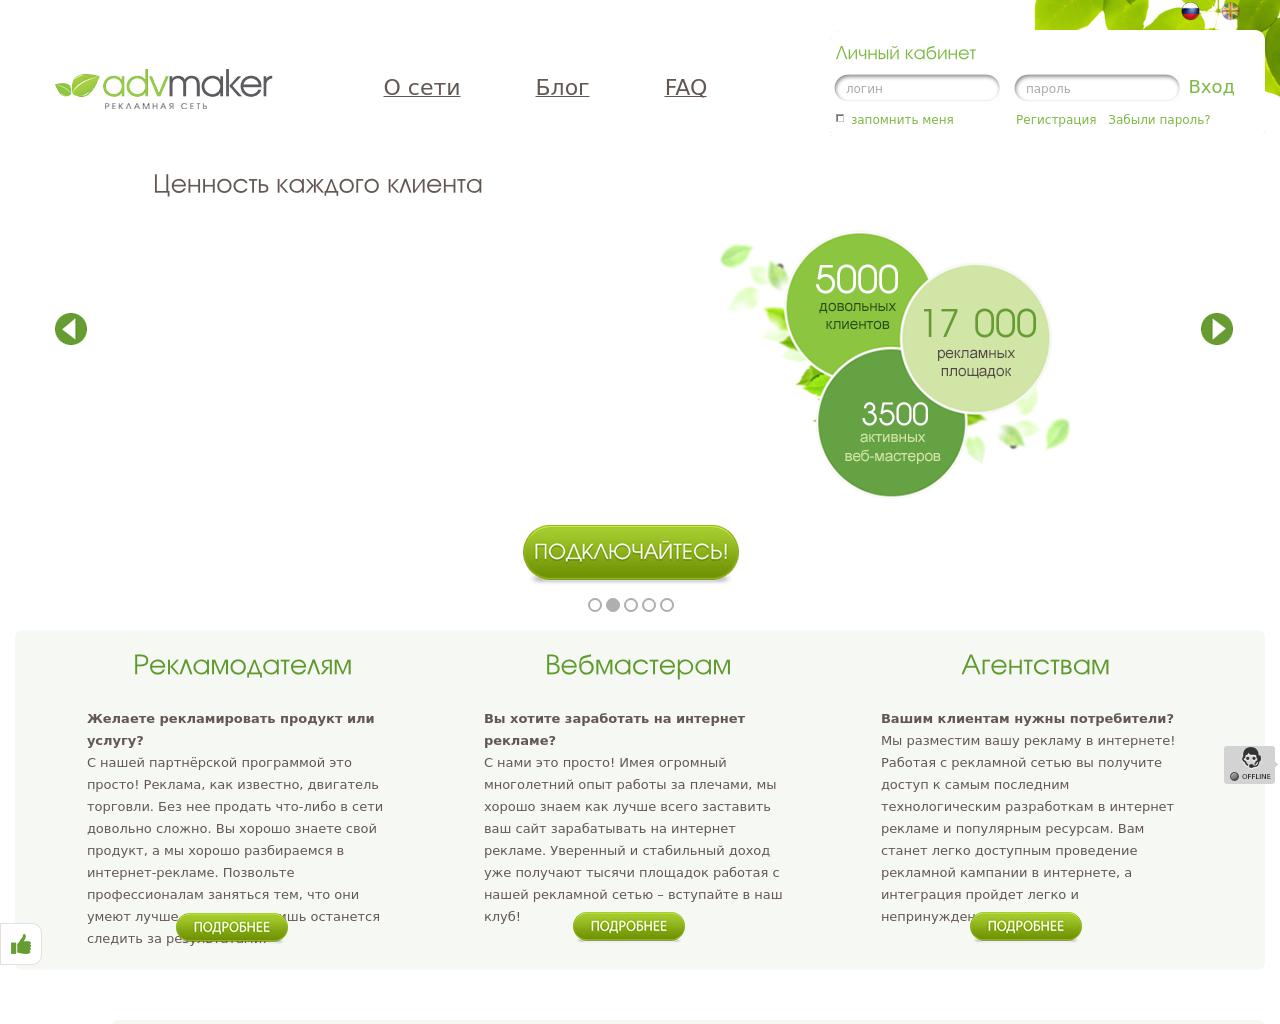 Advmaker-Advertising-Reviews-Pricing